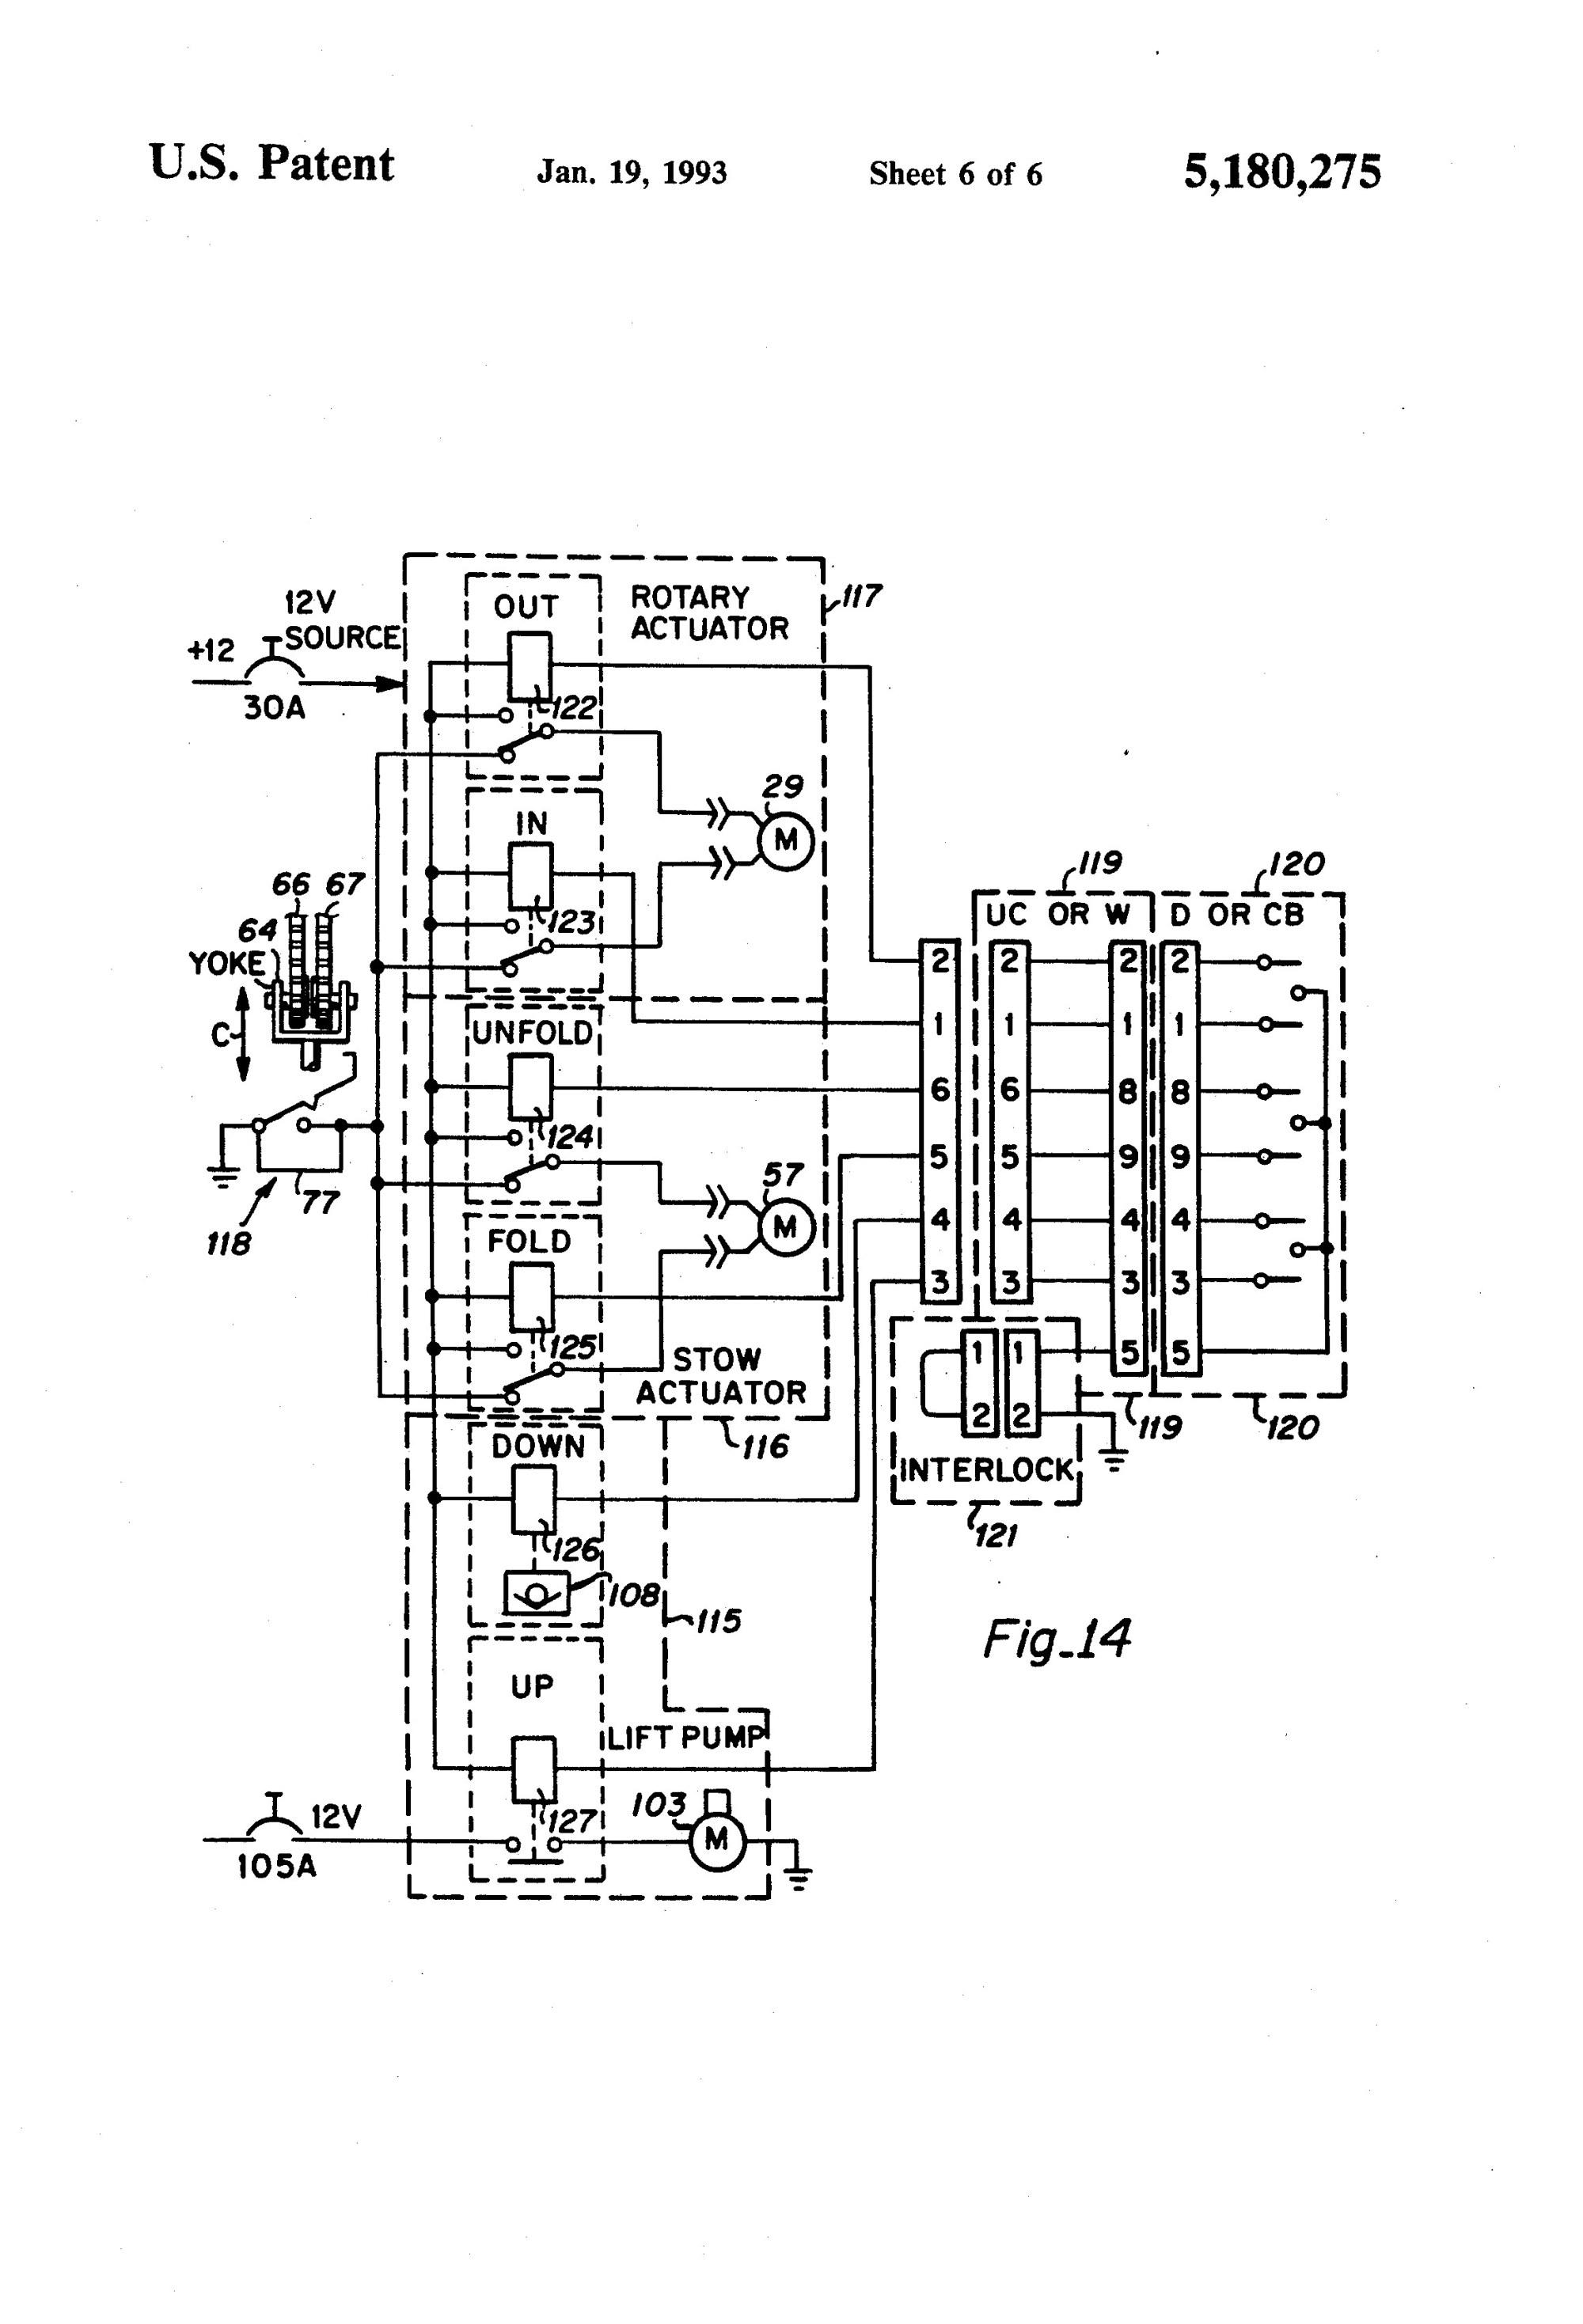 hight resolution of okin lift chair wiring diagram gallery sample rh faceitsalon com pride jet 3 power legend